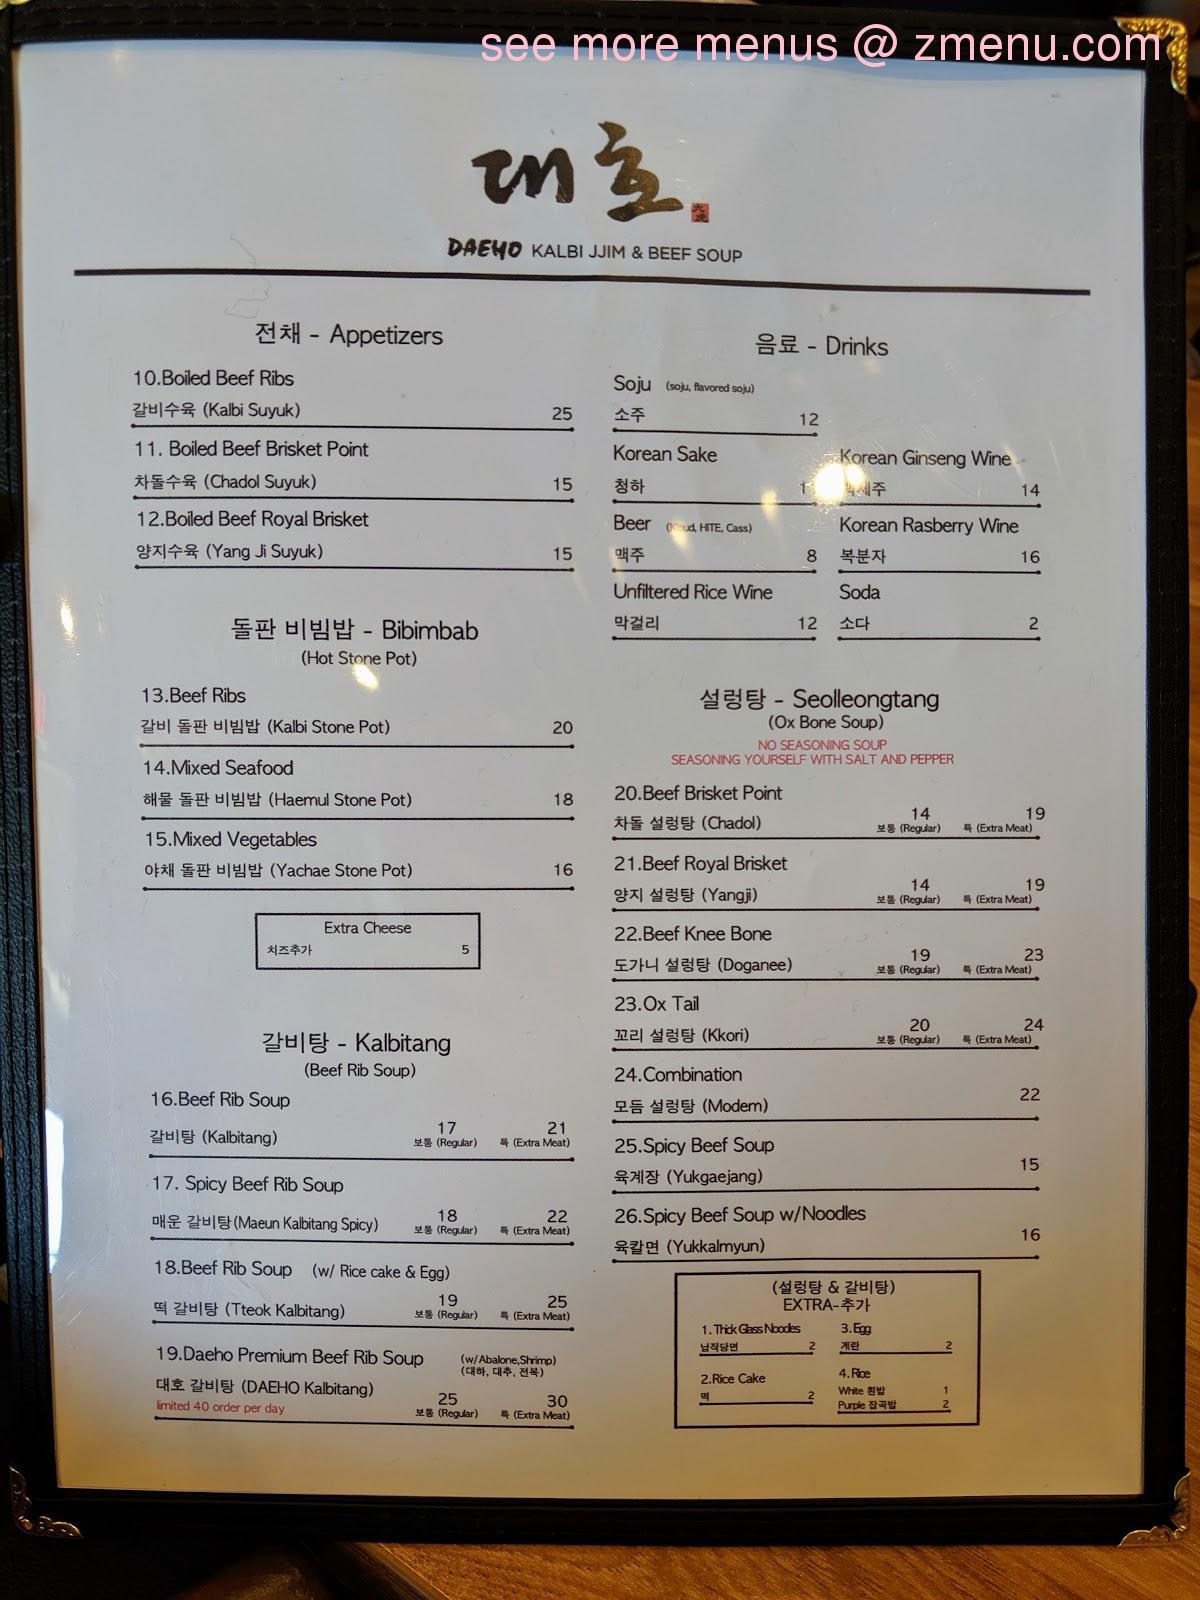 Online Menu Of Daeho Kalbi Jjim Beef Soup Restaurant Milpitas California 95035 Zmenu